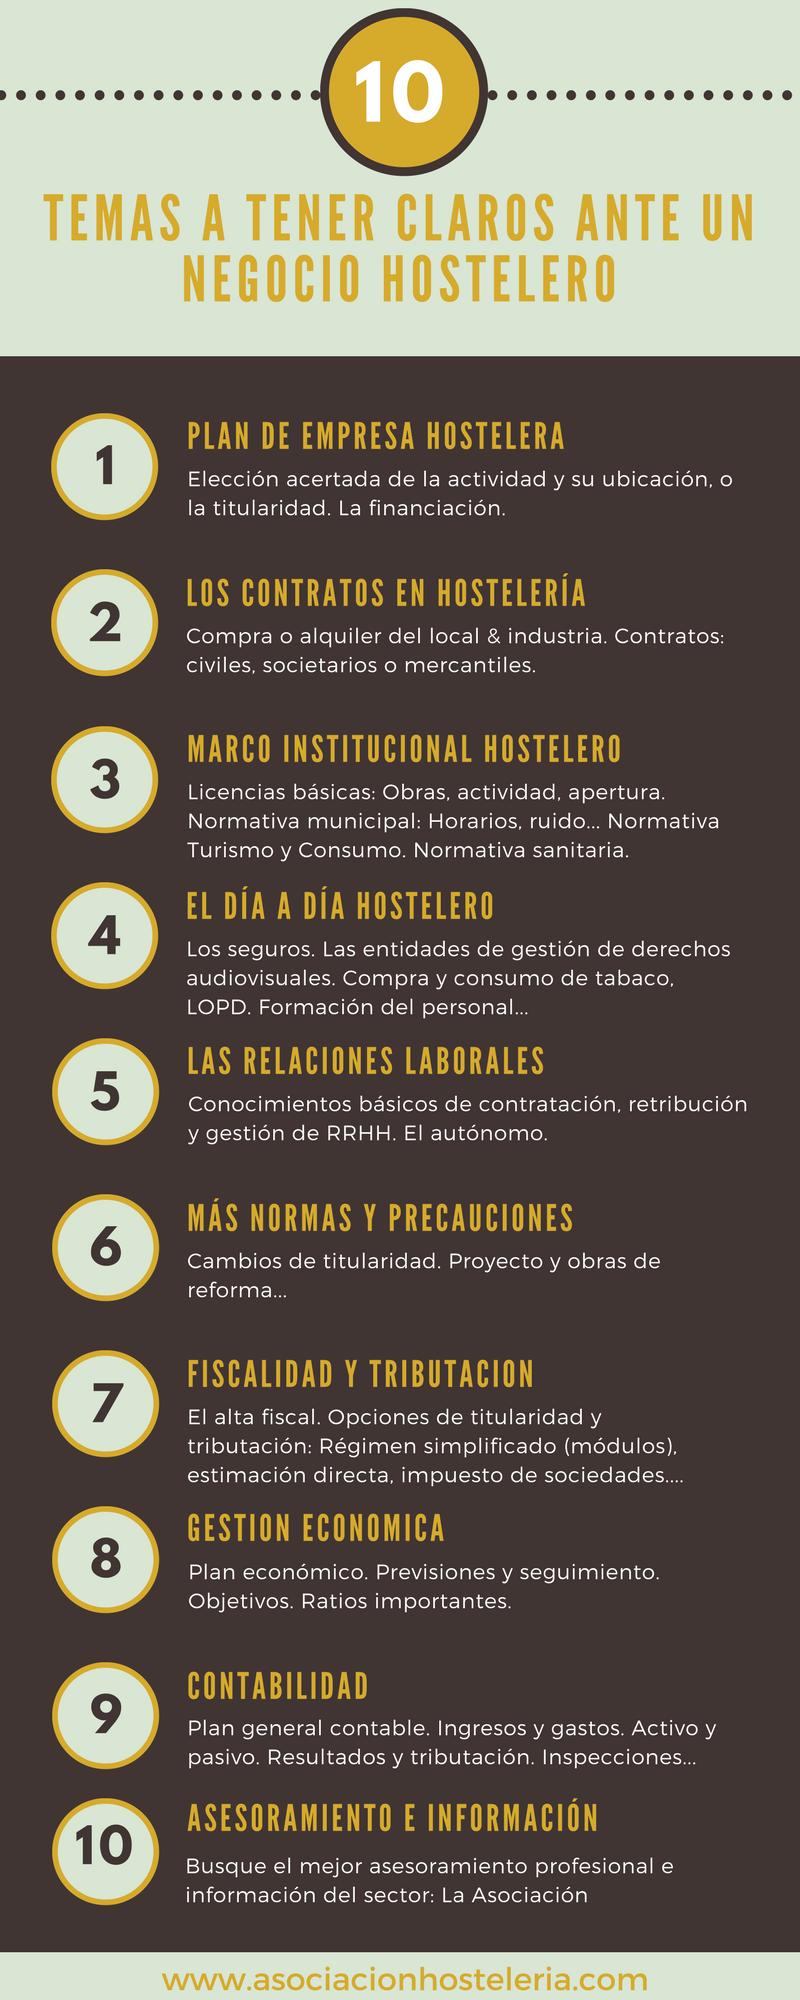 Infografía 10 temas a tener claros para gestionar un negocio hostelero